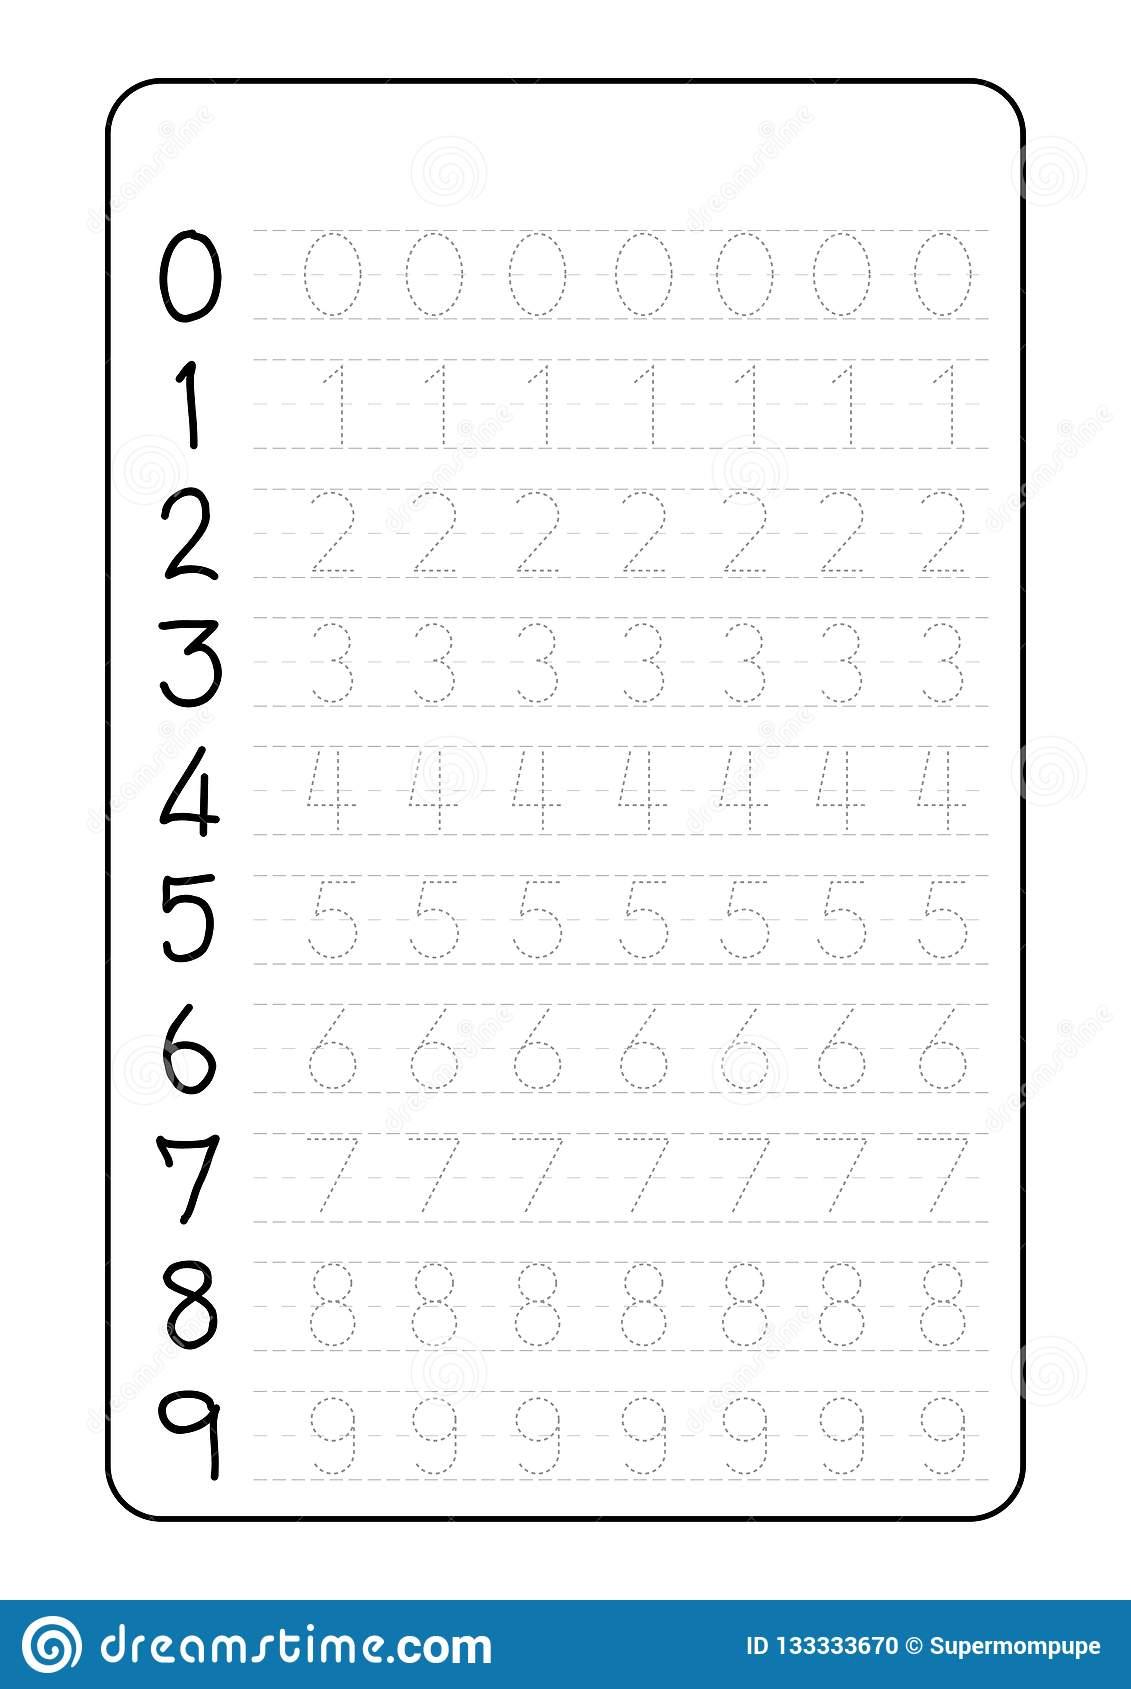 Alphabet Letters Tracing Worksheet With Number Children for Letter 6 Worksheets